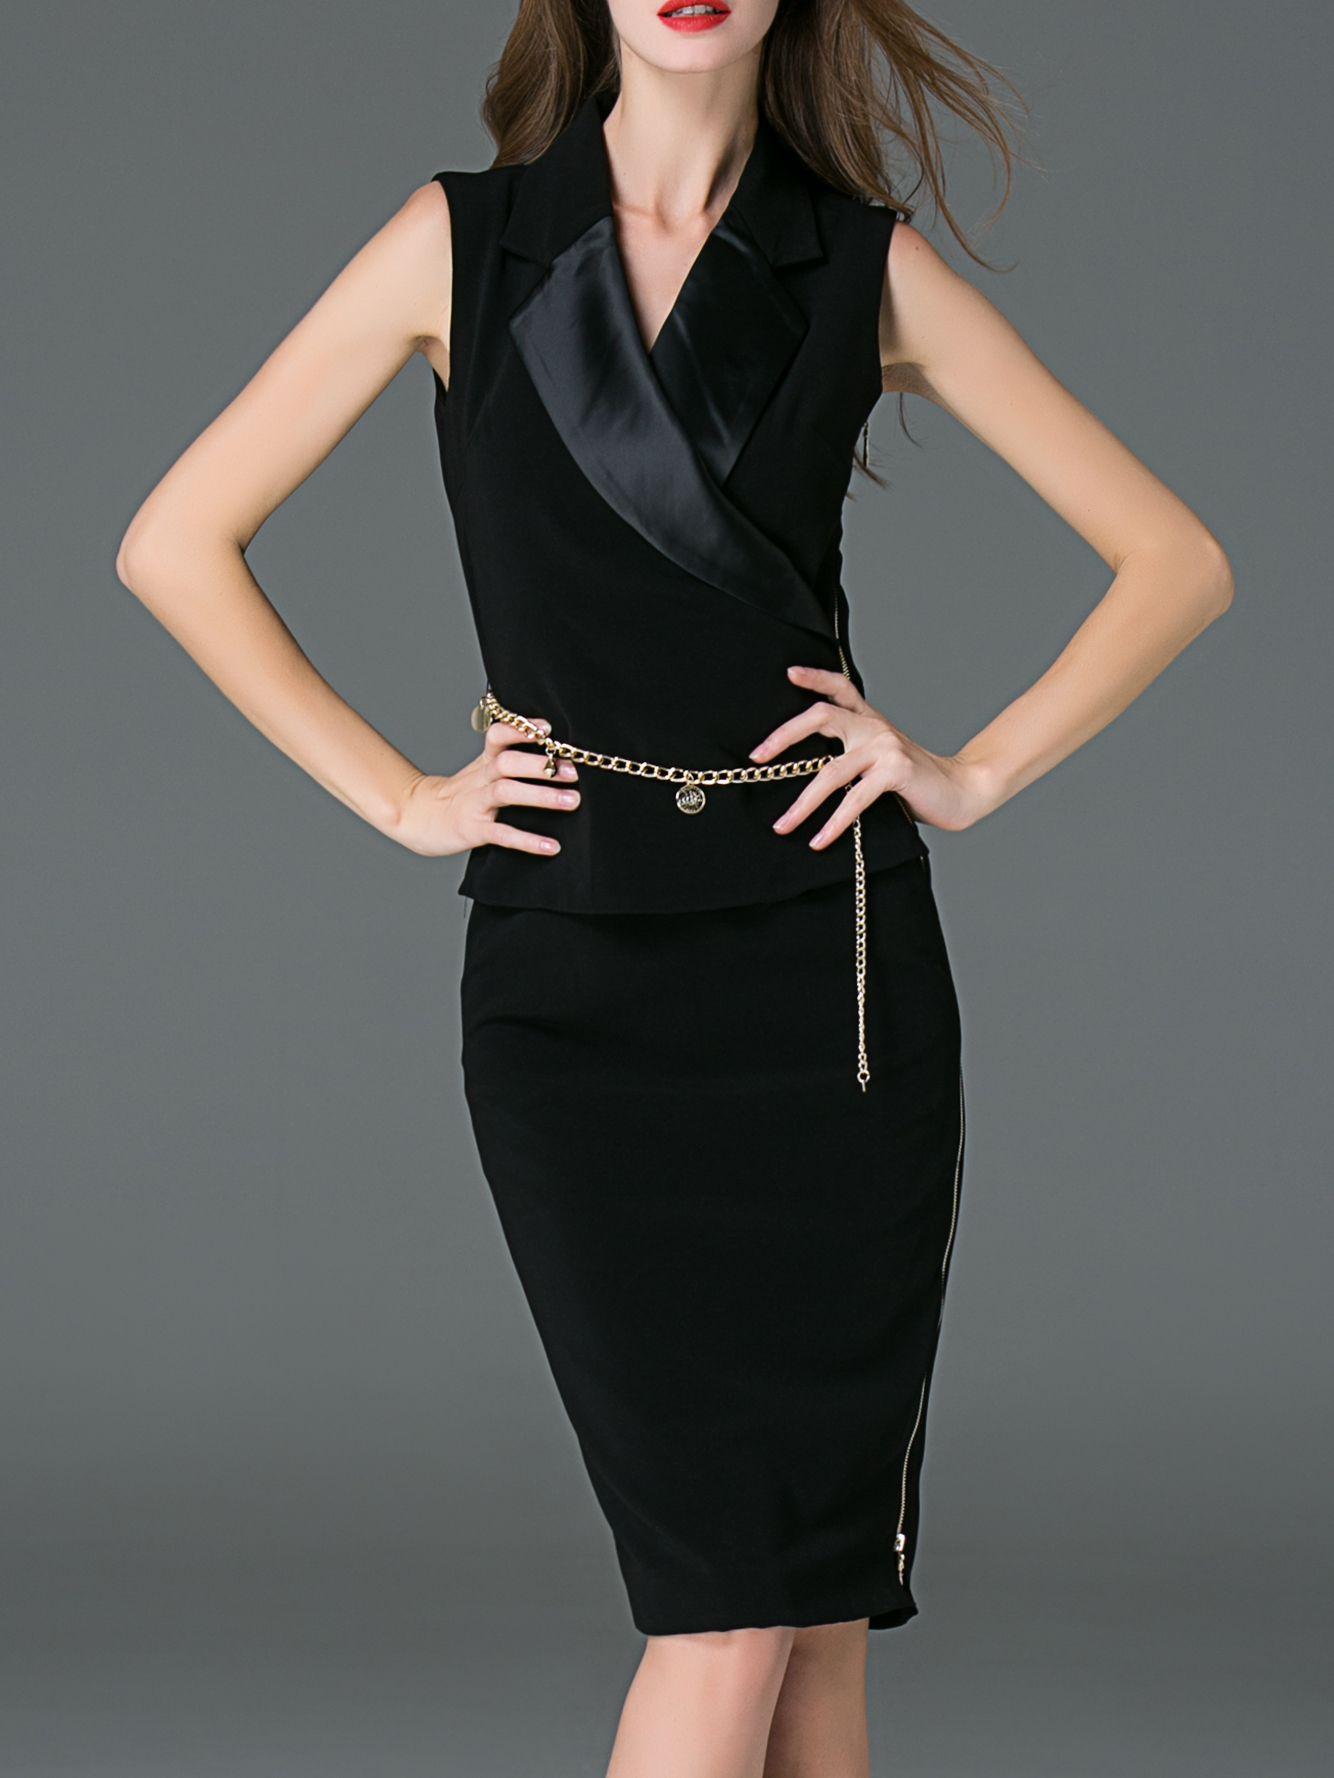 Image of black v neck zipper sheath dress clothing pinterest